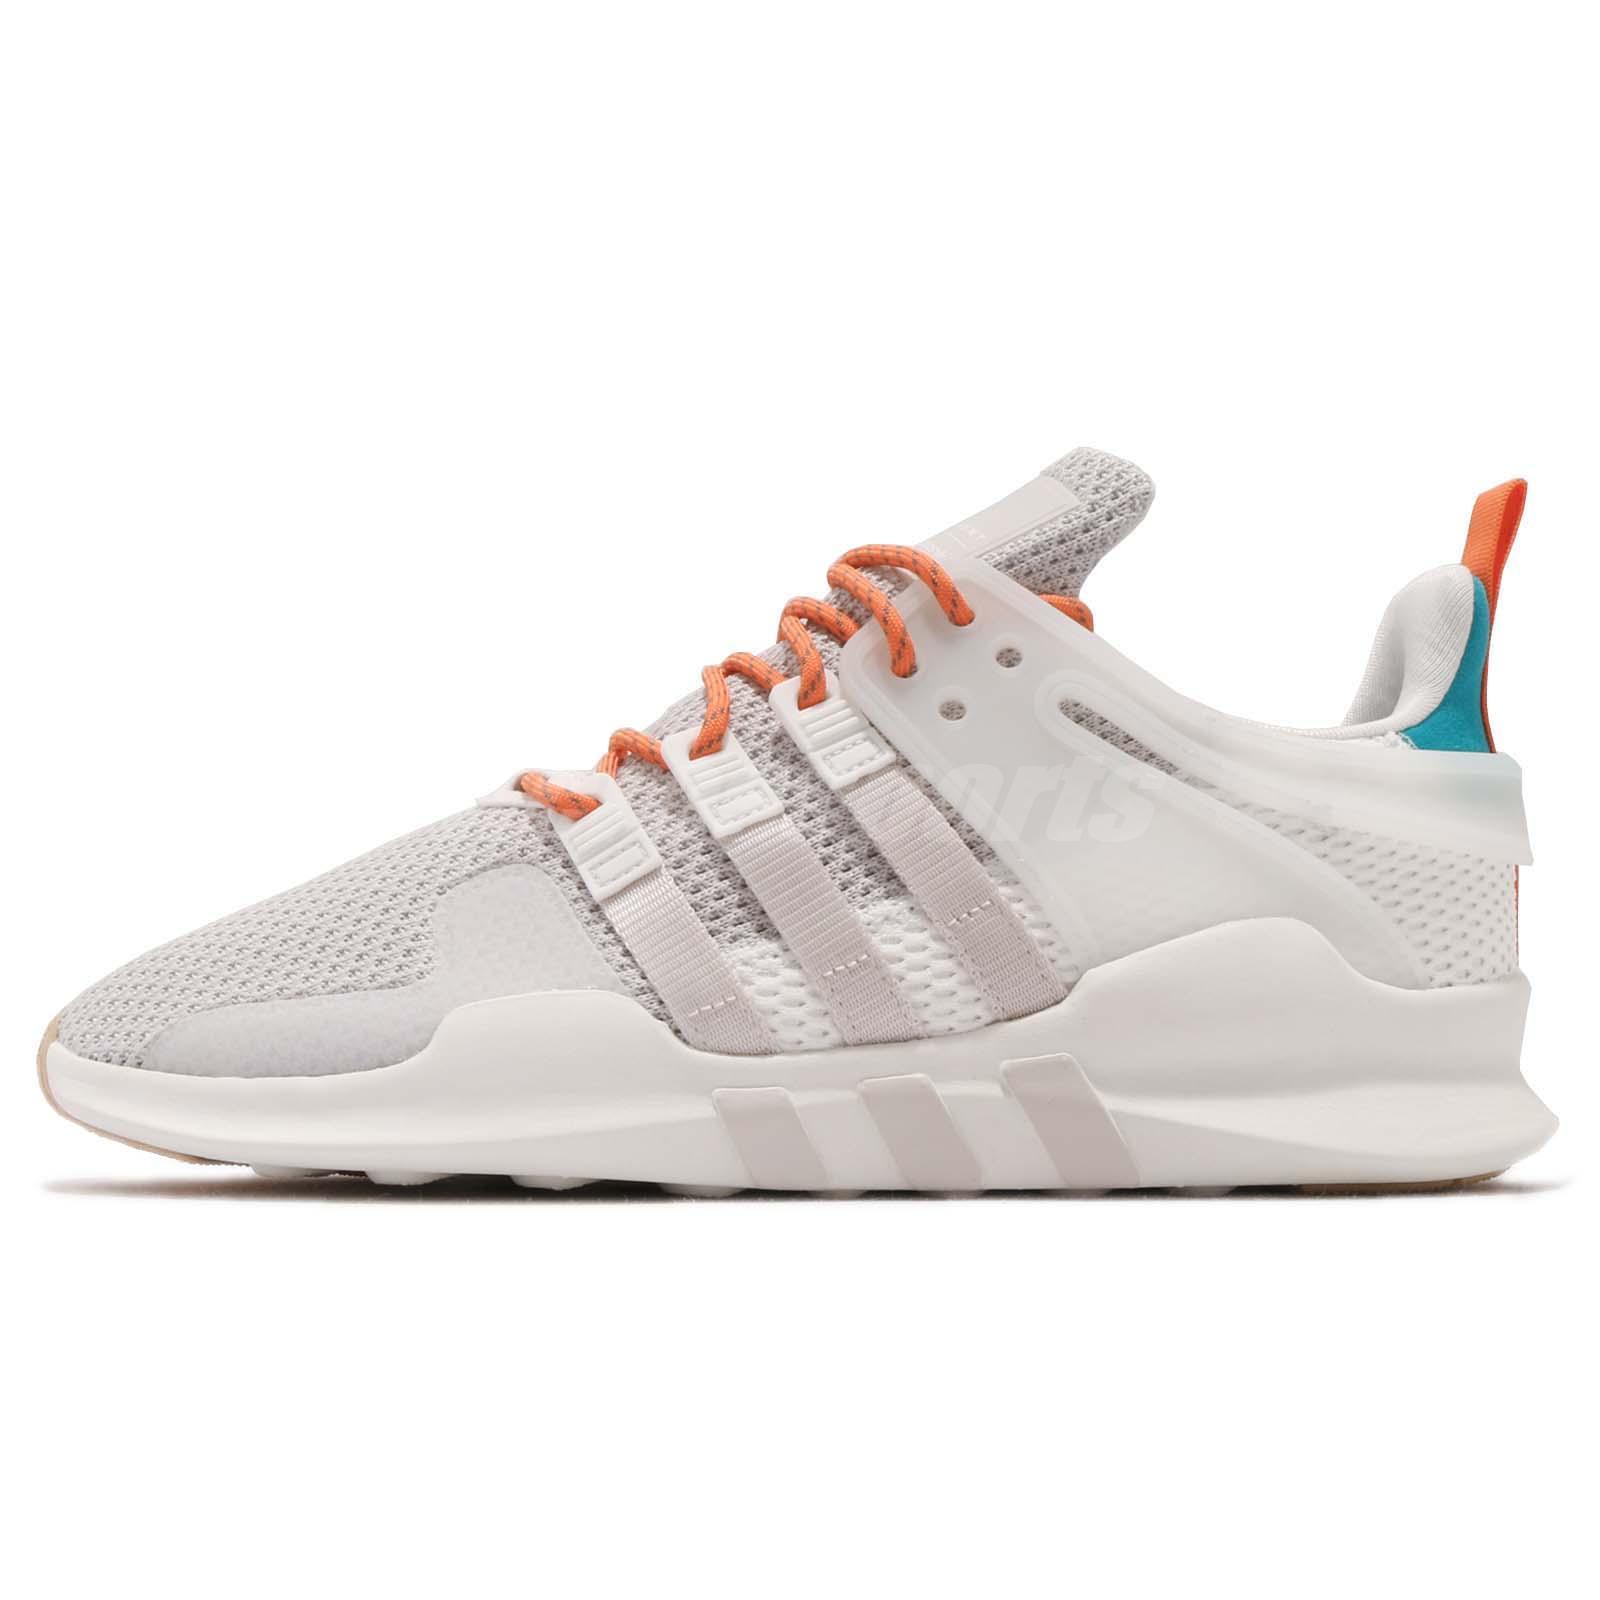 uk availability 6f603 df629 adidas Originals EQT Support ADV Summer White Tint Men Running Shoes CQ3042